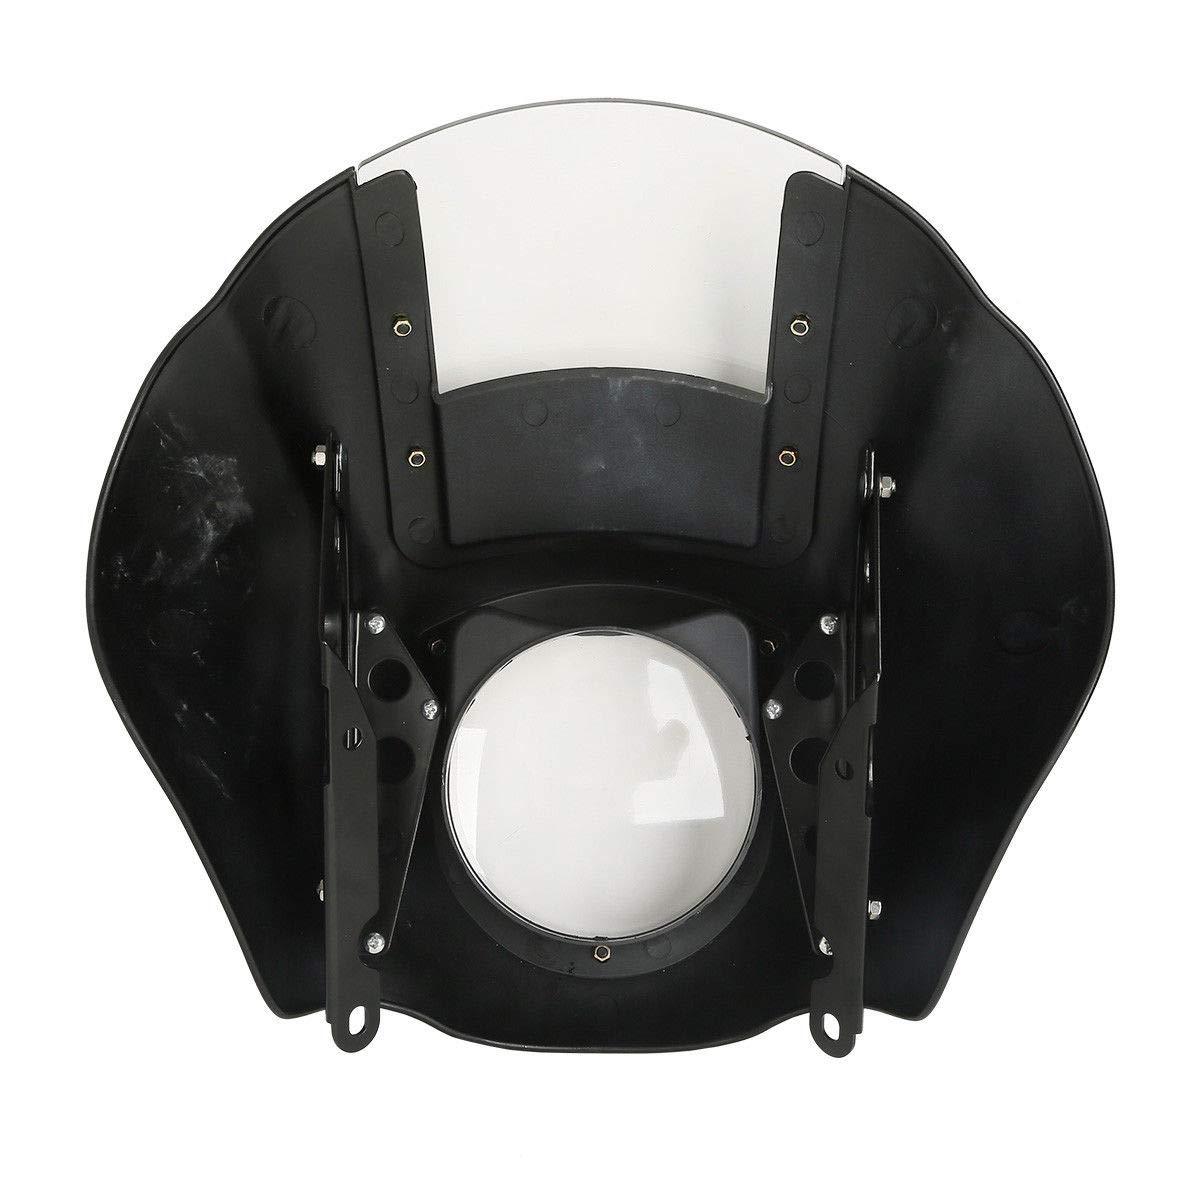 07-17 HARLEY FXDB3 Memphis Shades Trigger-Lock Mounting Kit Black//Gauntlet Fairing